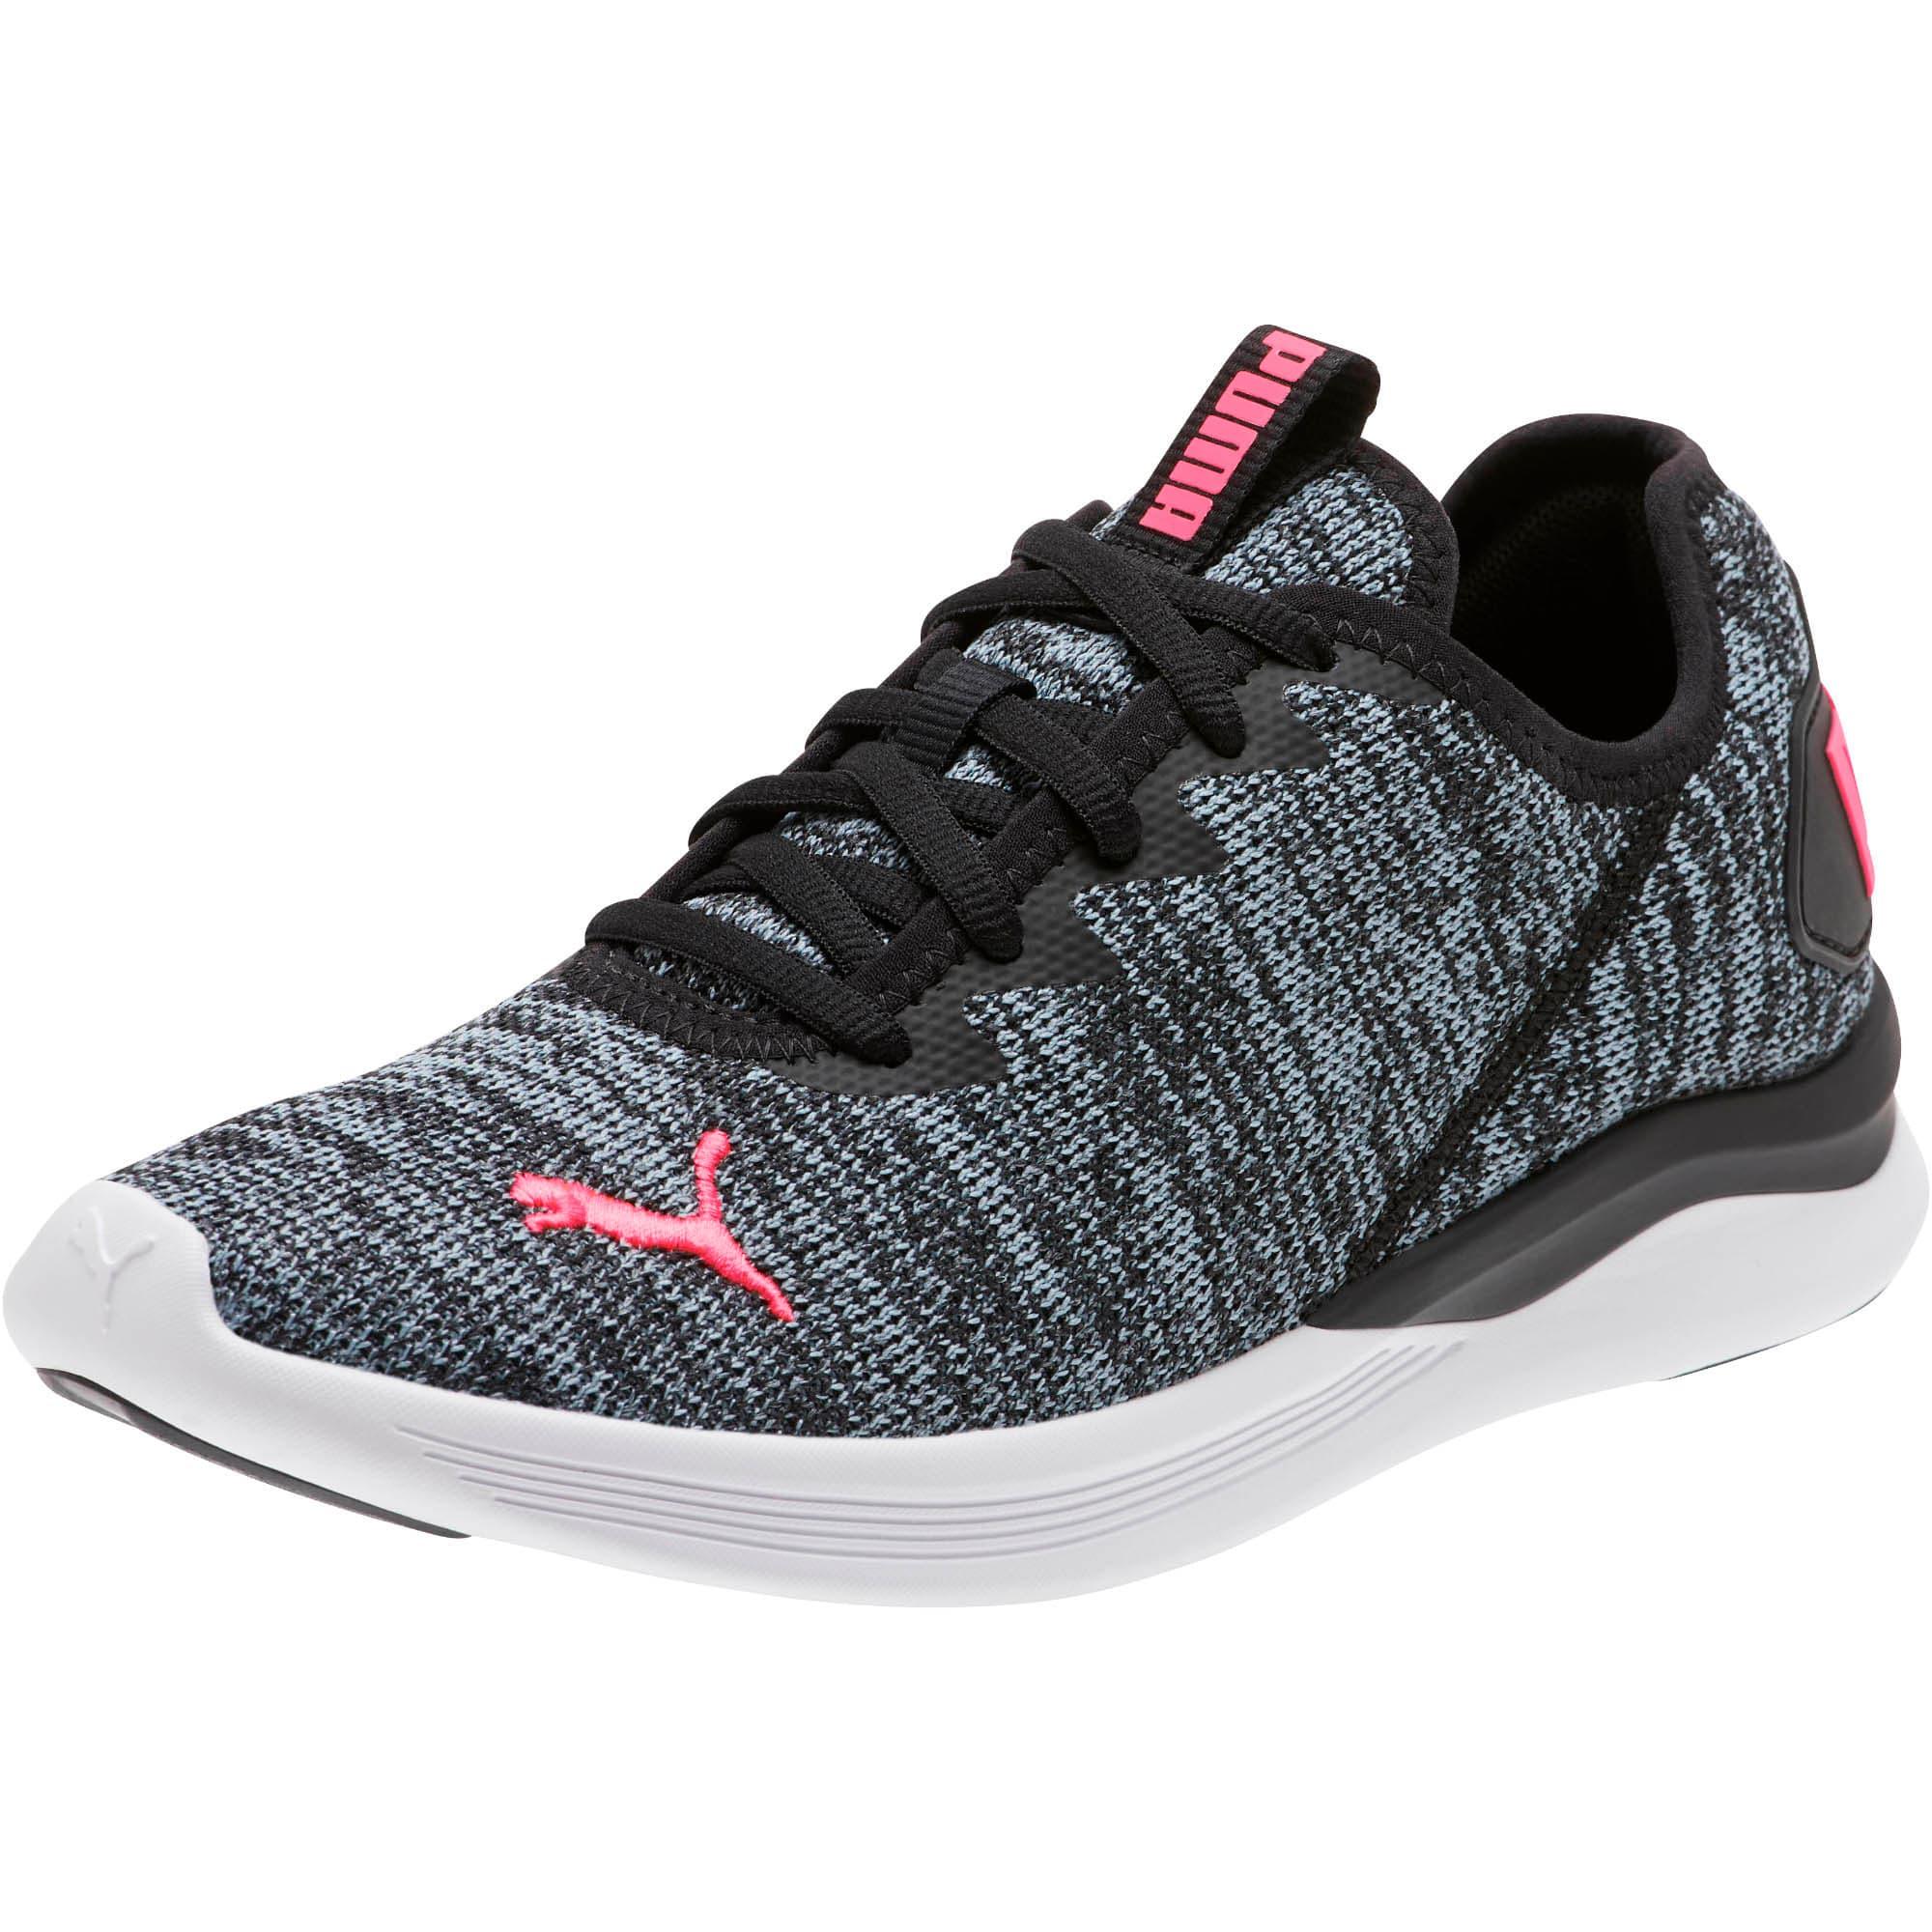 Thumbnail 1 of Ballast Women's Running Shoes, Puma Black-Pink Alert, medium